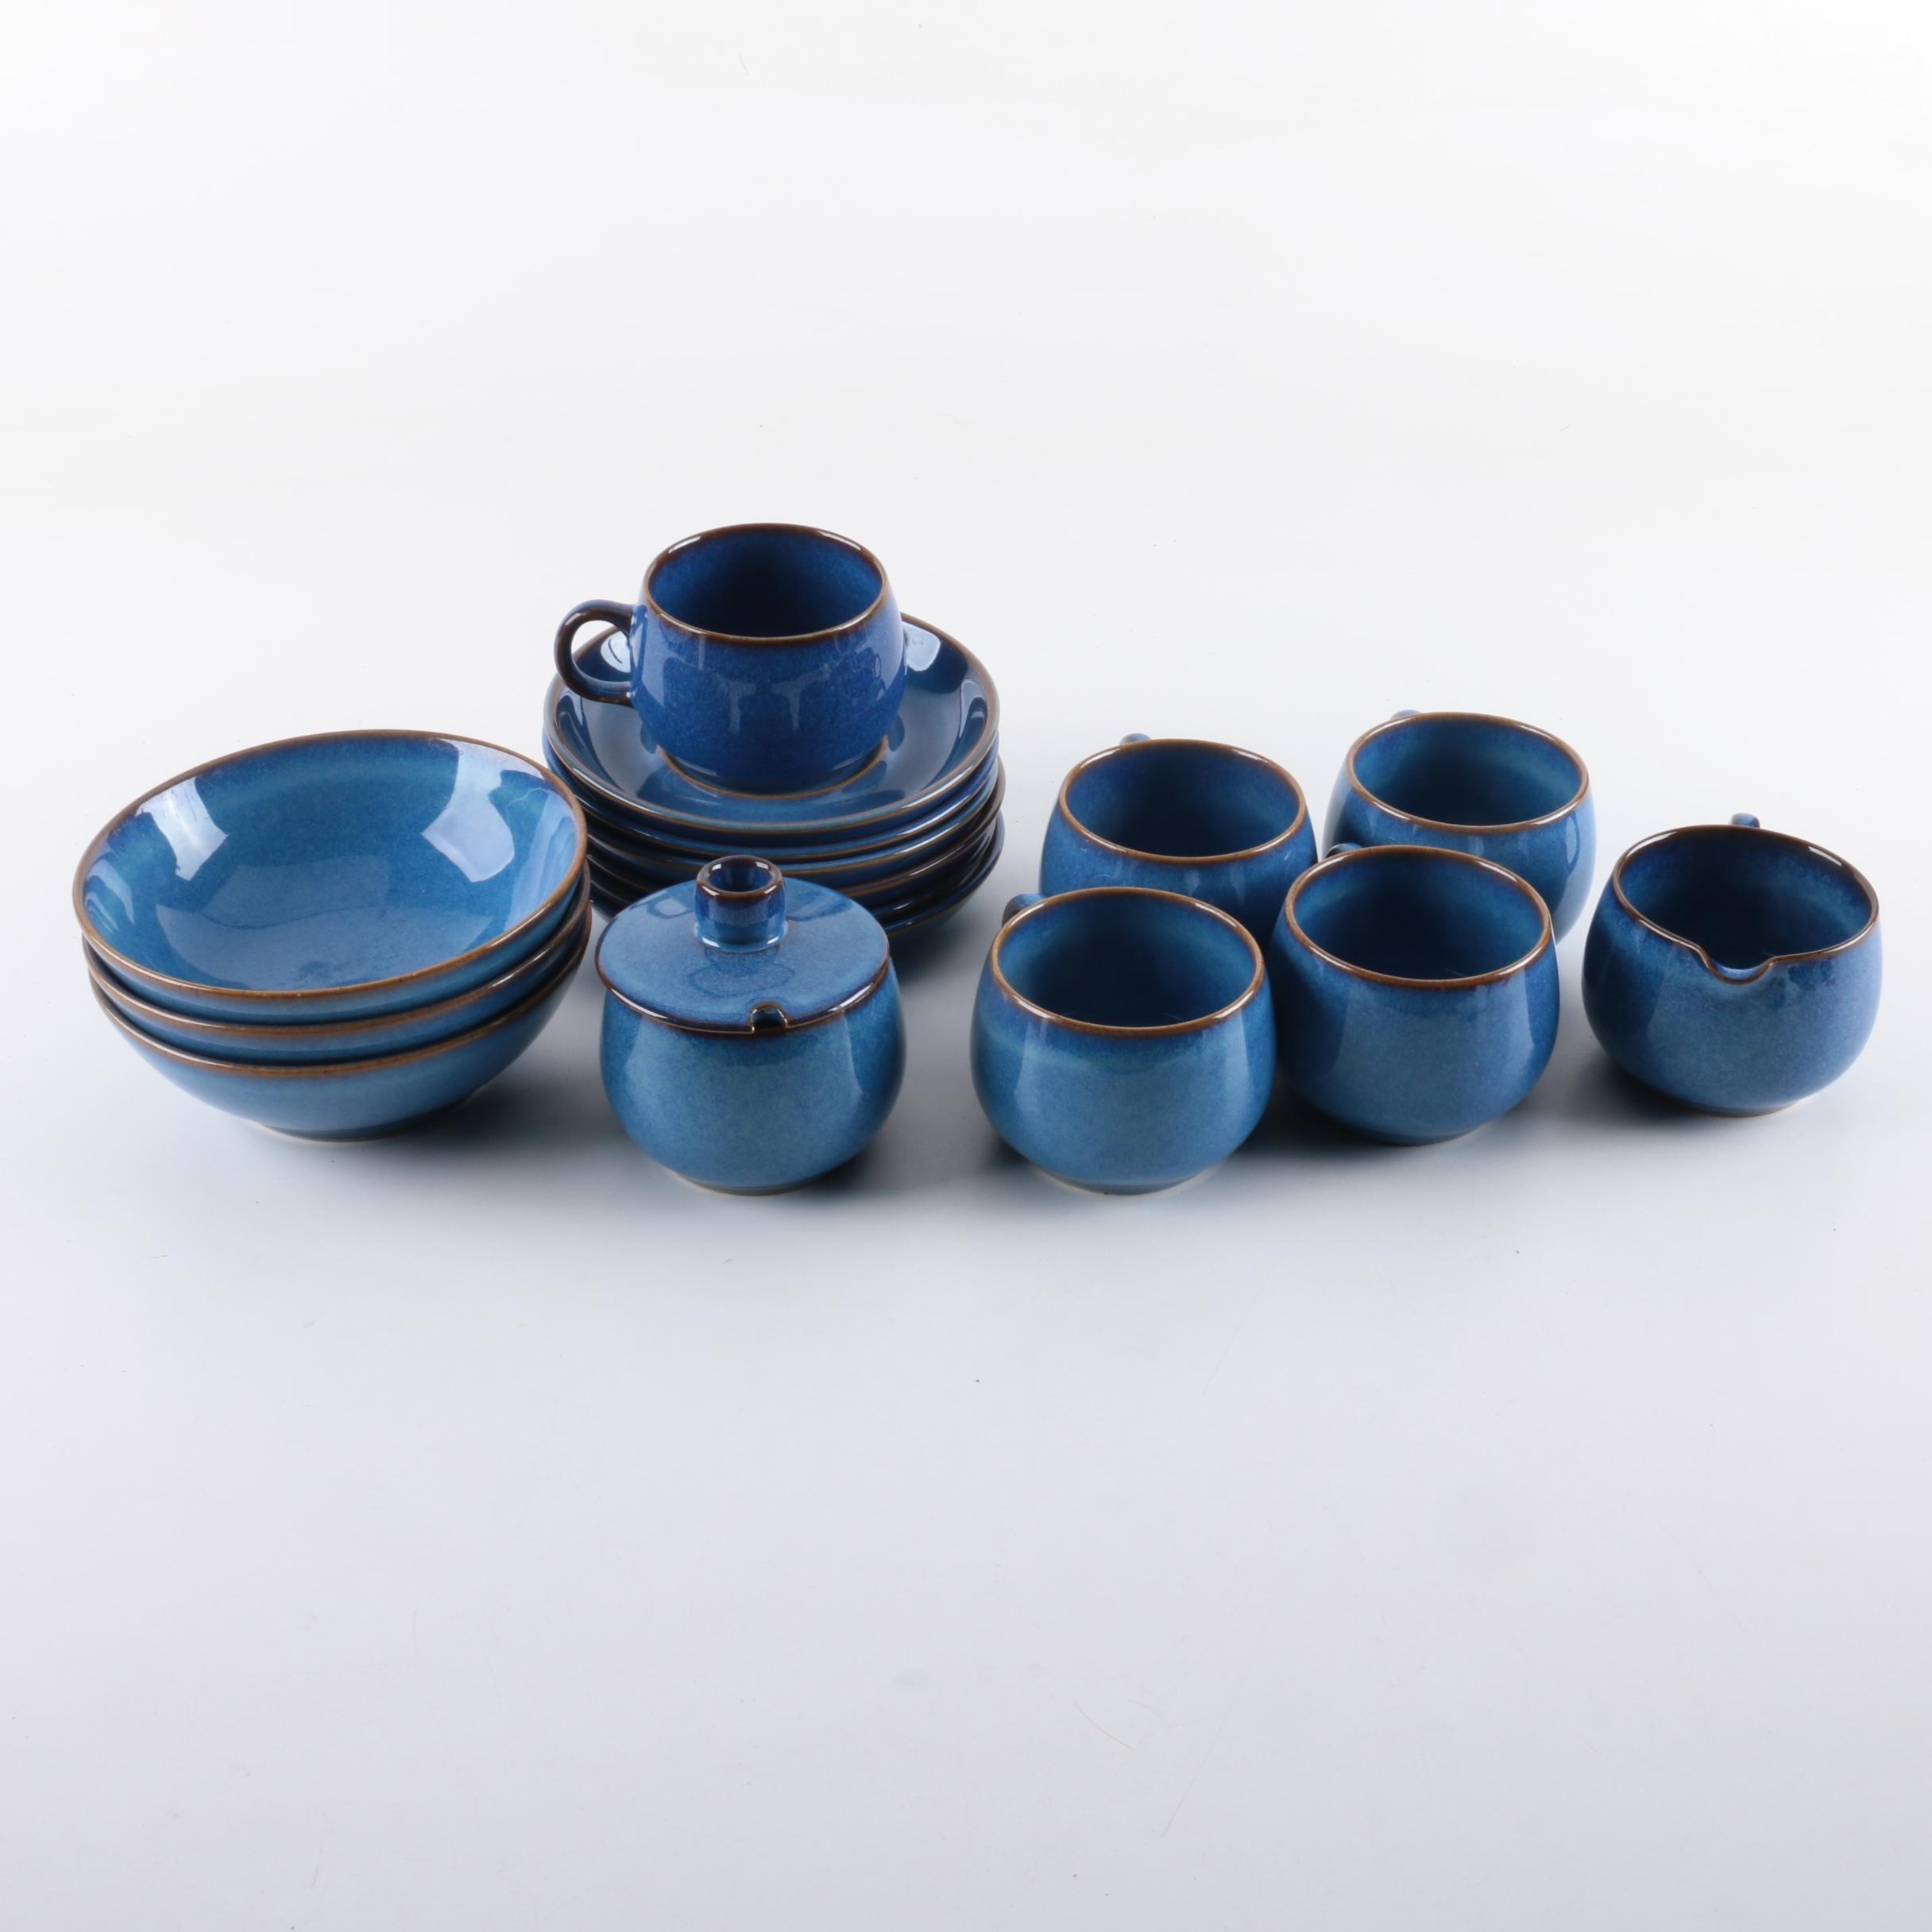 Denby-Langley  English Blue  Stoneware Tableware ... & Denby-Langley